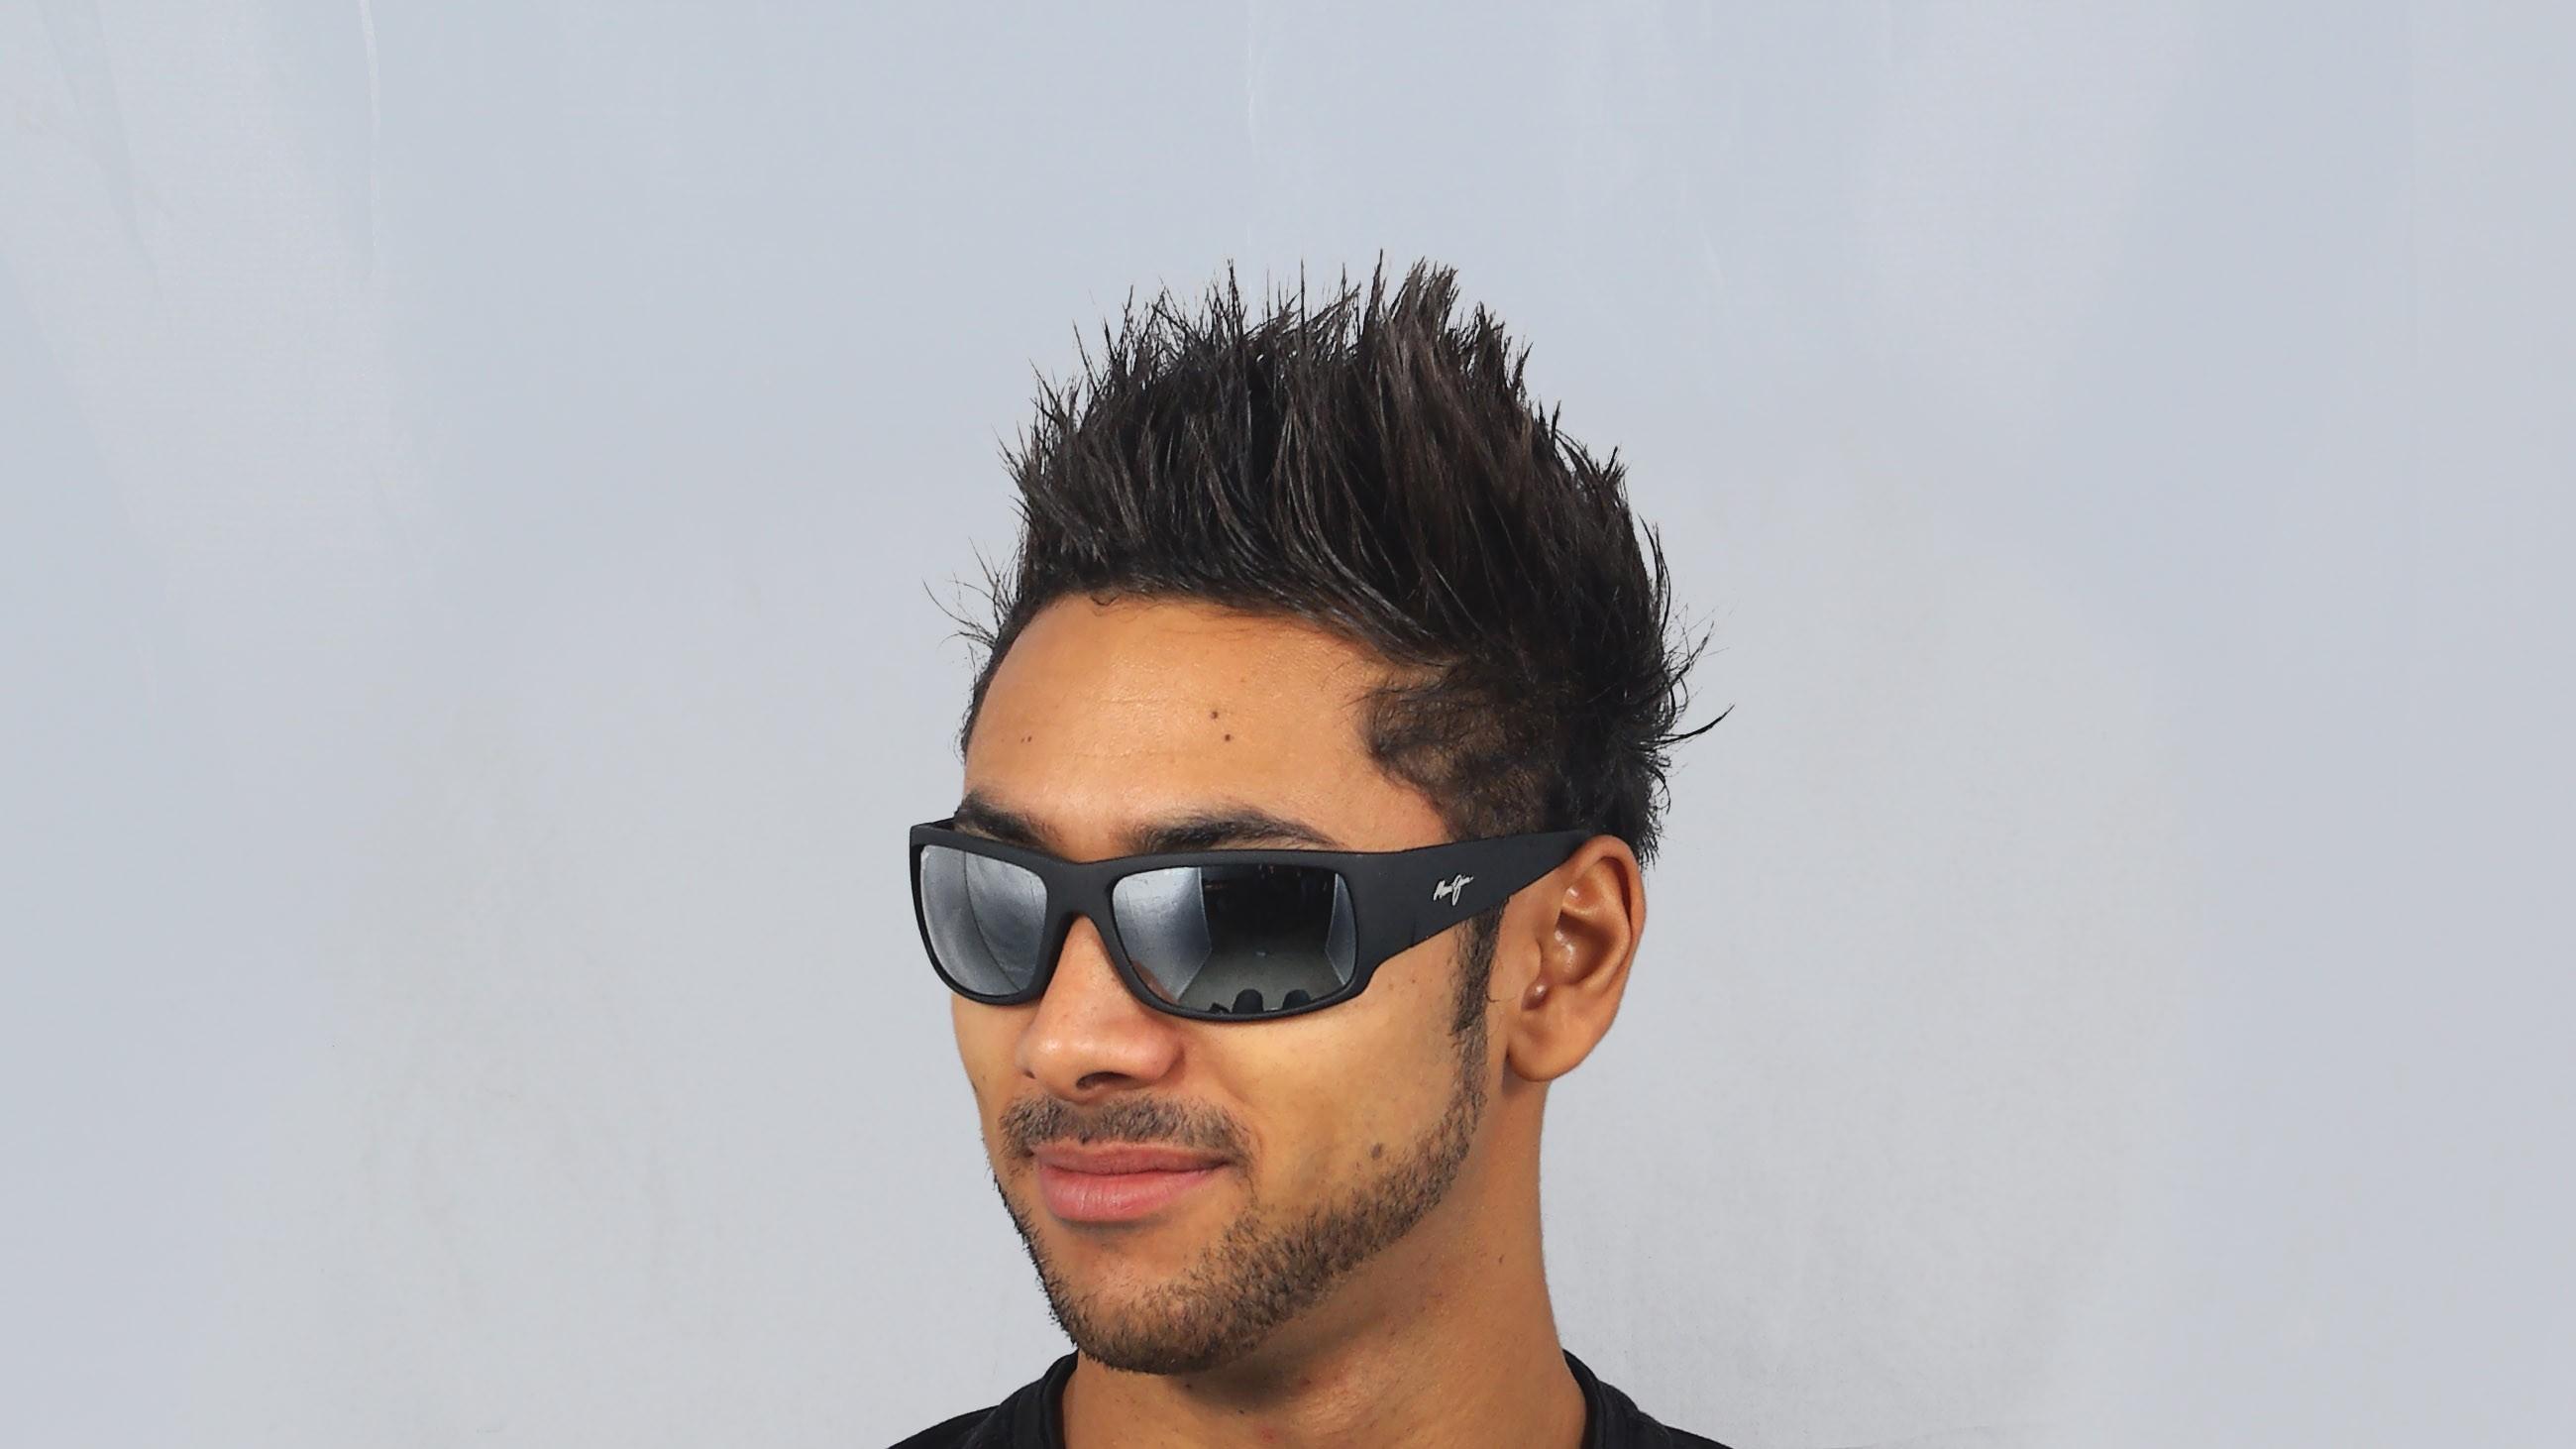 0045bfdcae8 Sunglasses Maui Jim World Cup Black 266-02MR 64-19 Large Polarized Mirror